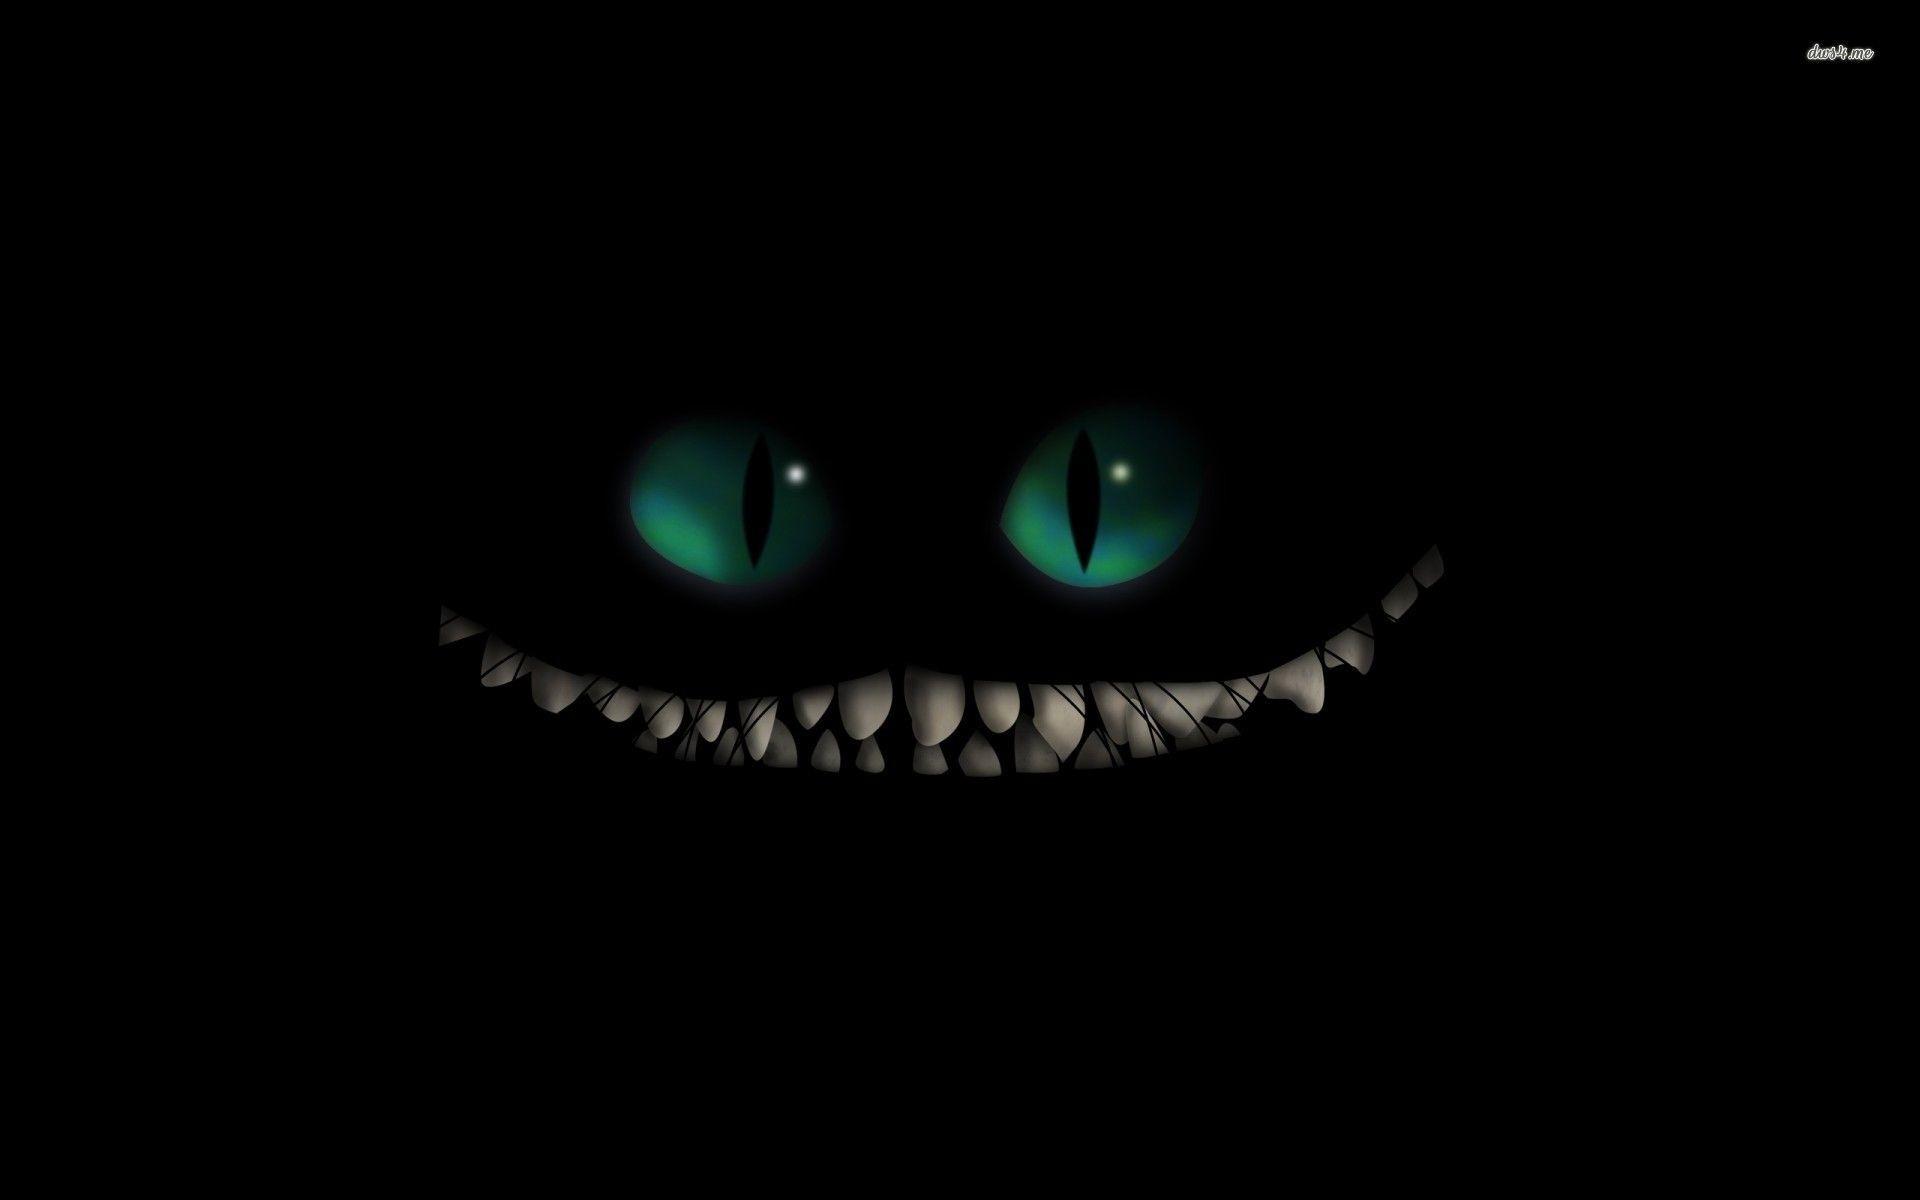 Cheshire Cat Smile Wallpaper